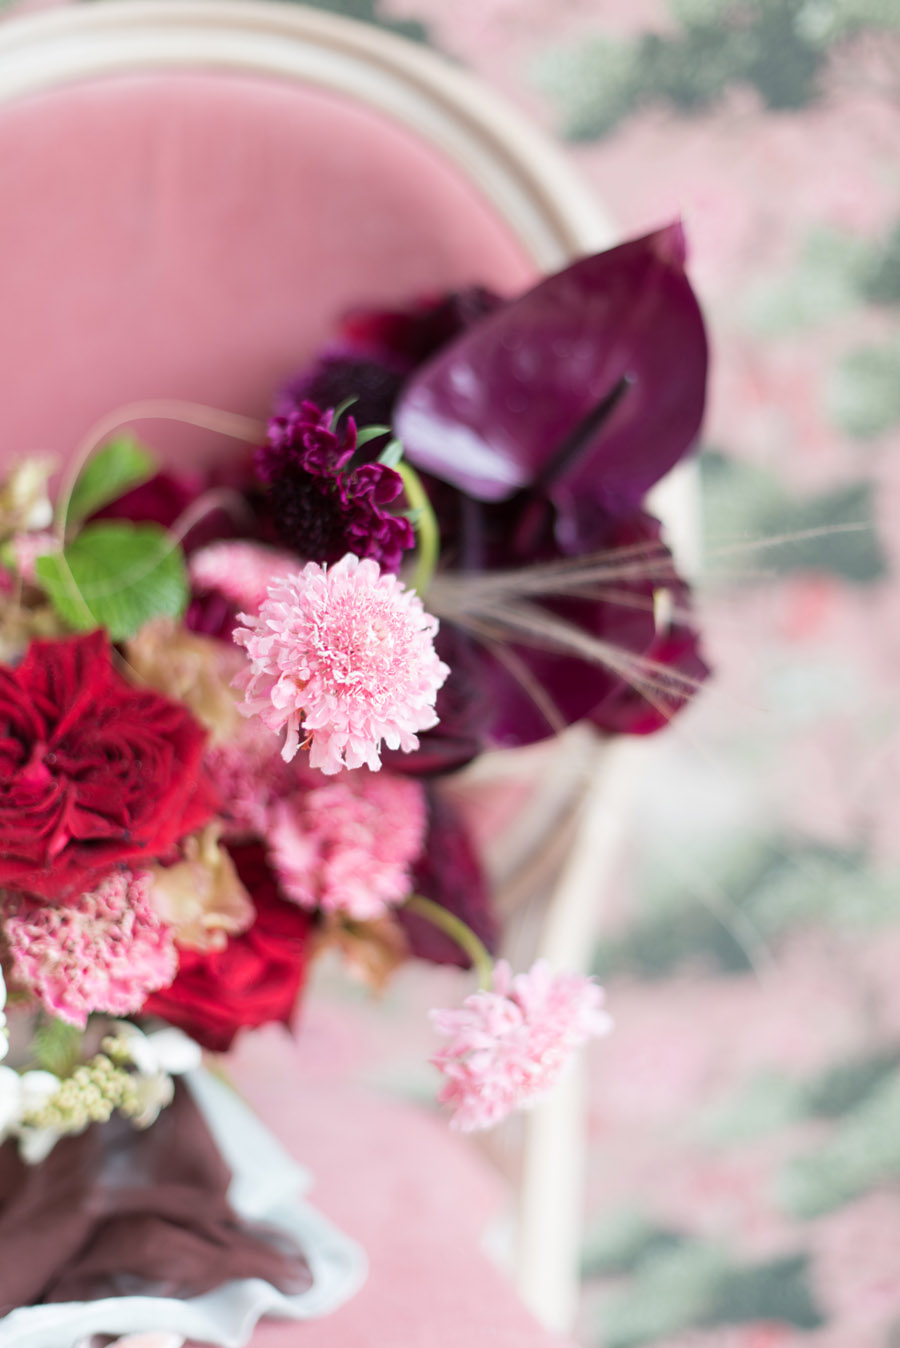 floral wedding ideas at Millbridge Court on English Wedding - photo credit Julie Michaelsen Photography (18)